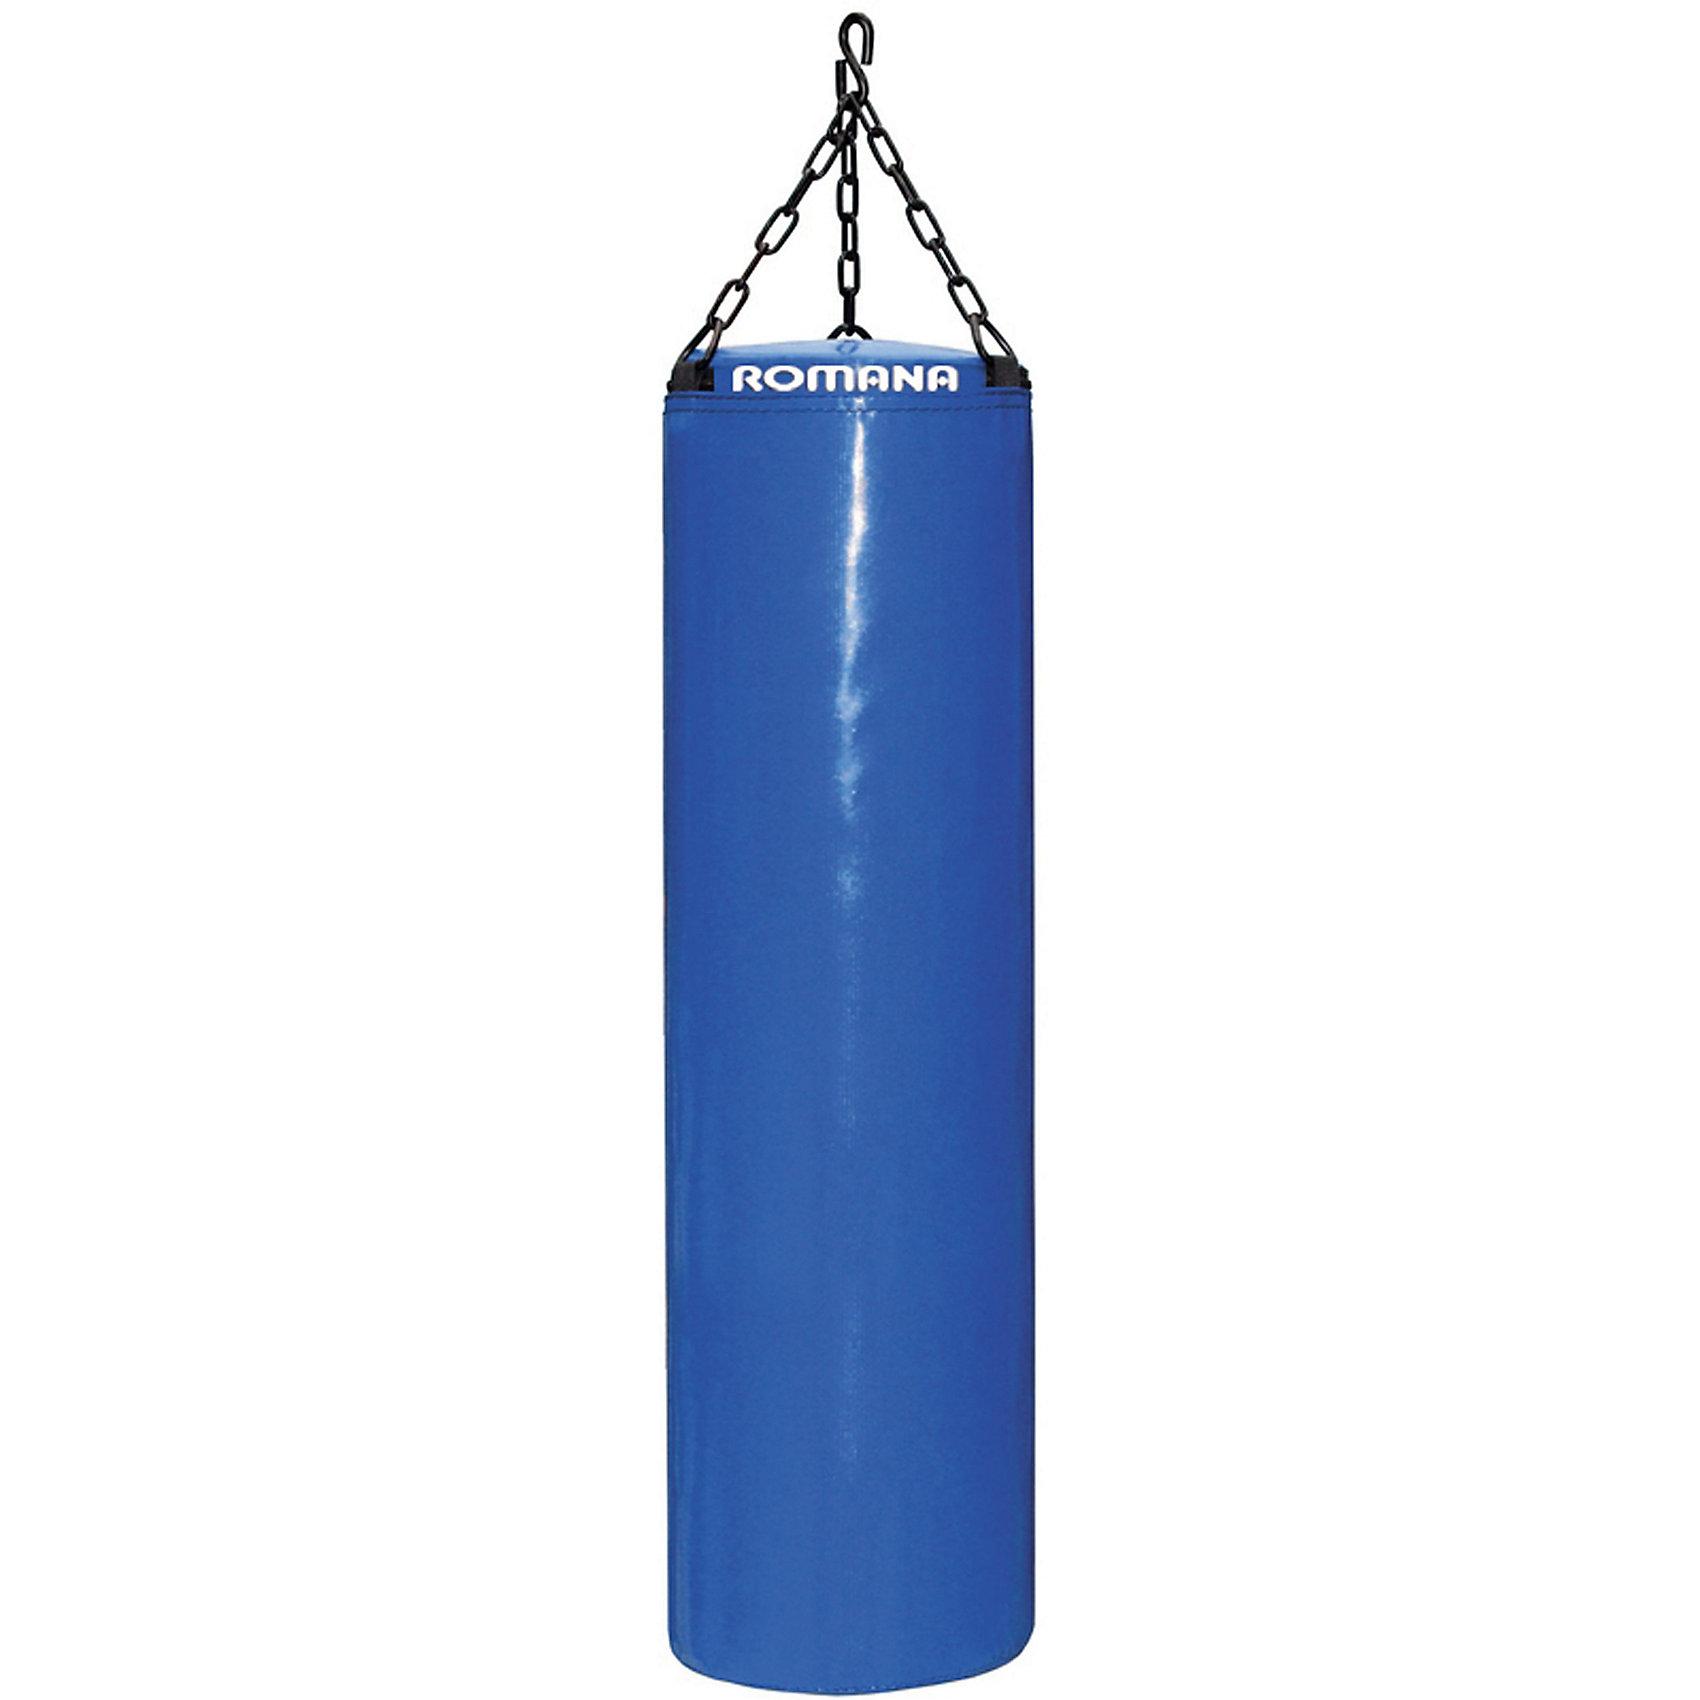 Мешок боксерский, вес 20кг, ROMANA от myToys